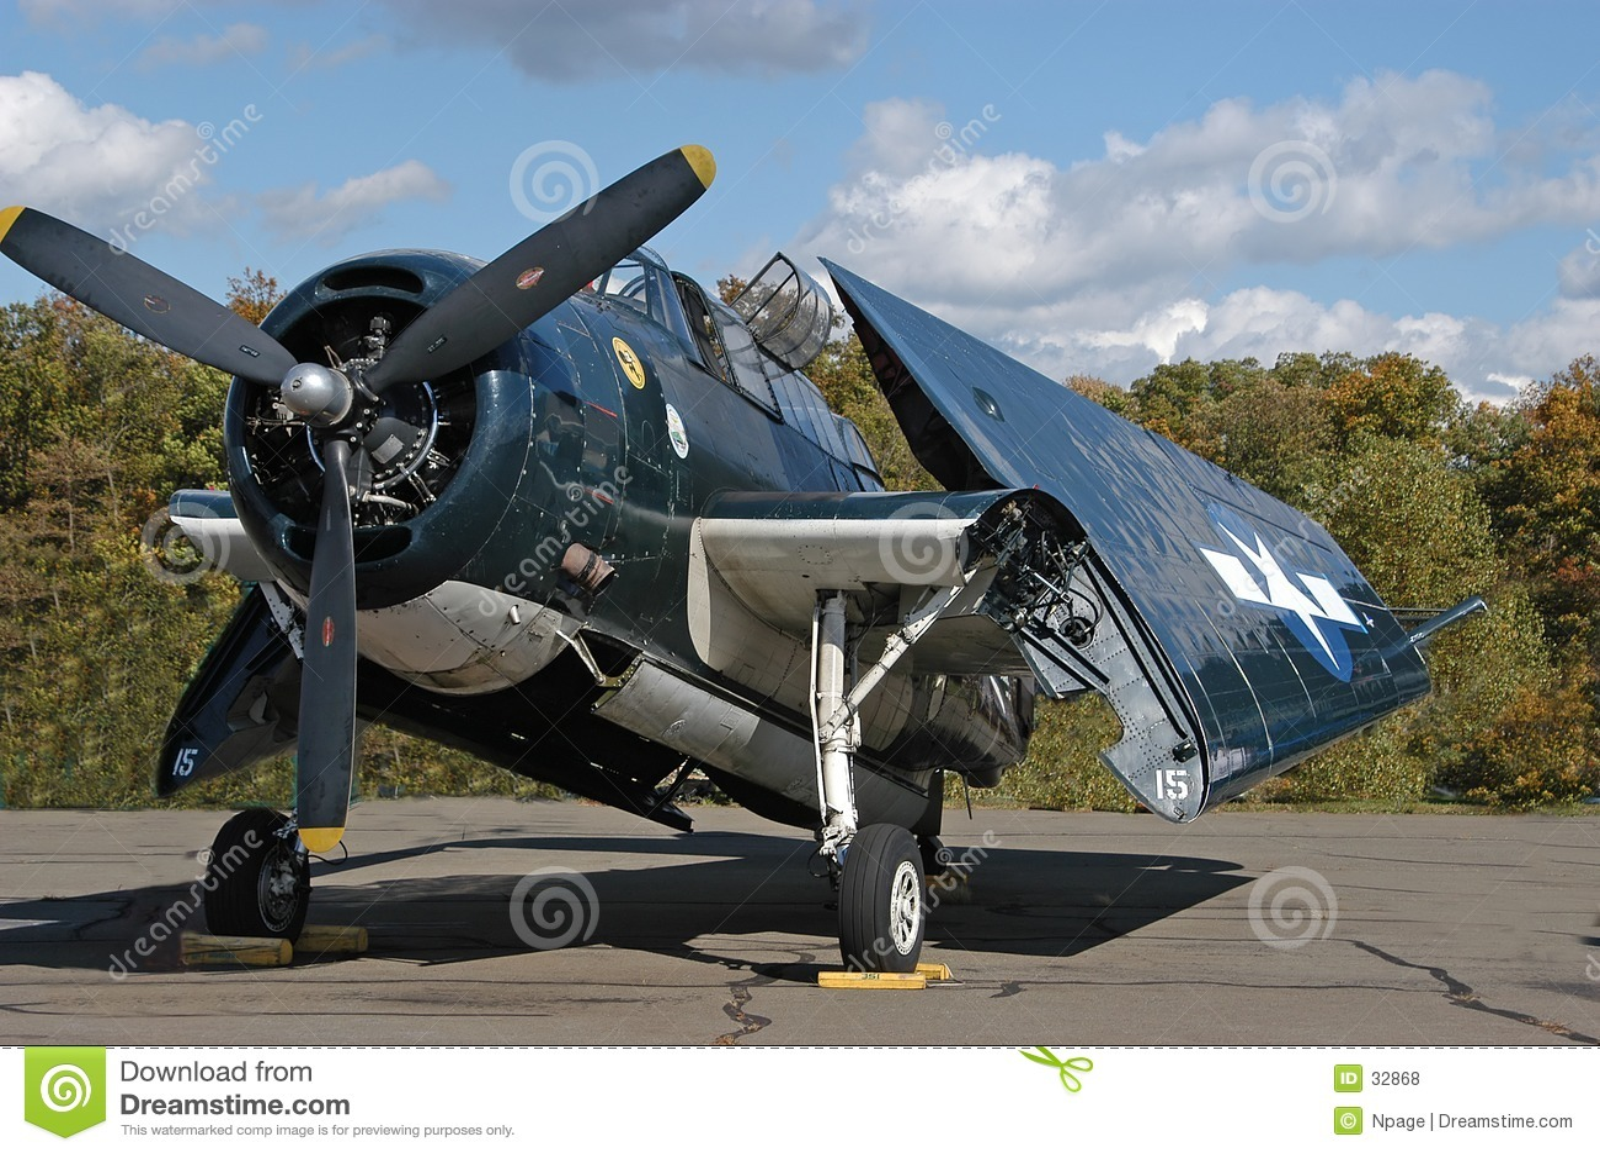 Navy Airplane